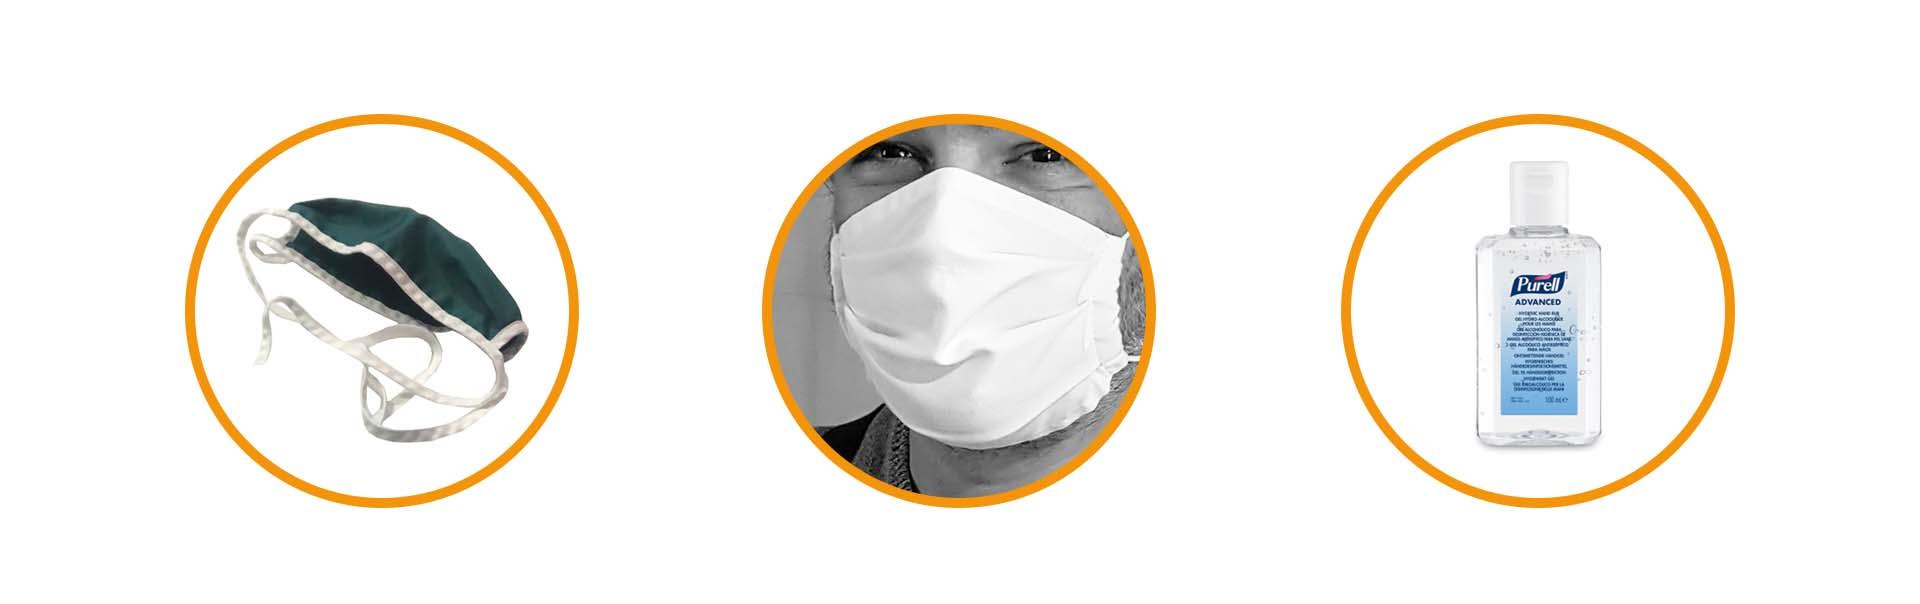 papelmatic-higiene-professional-kits-proteccio-covid19-tipus